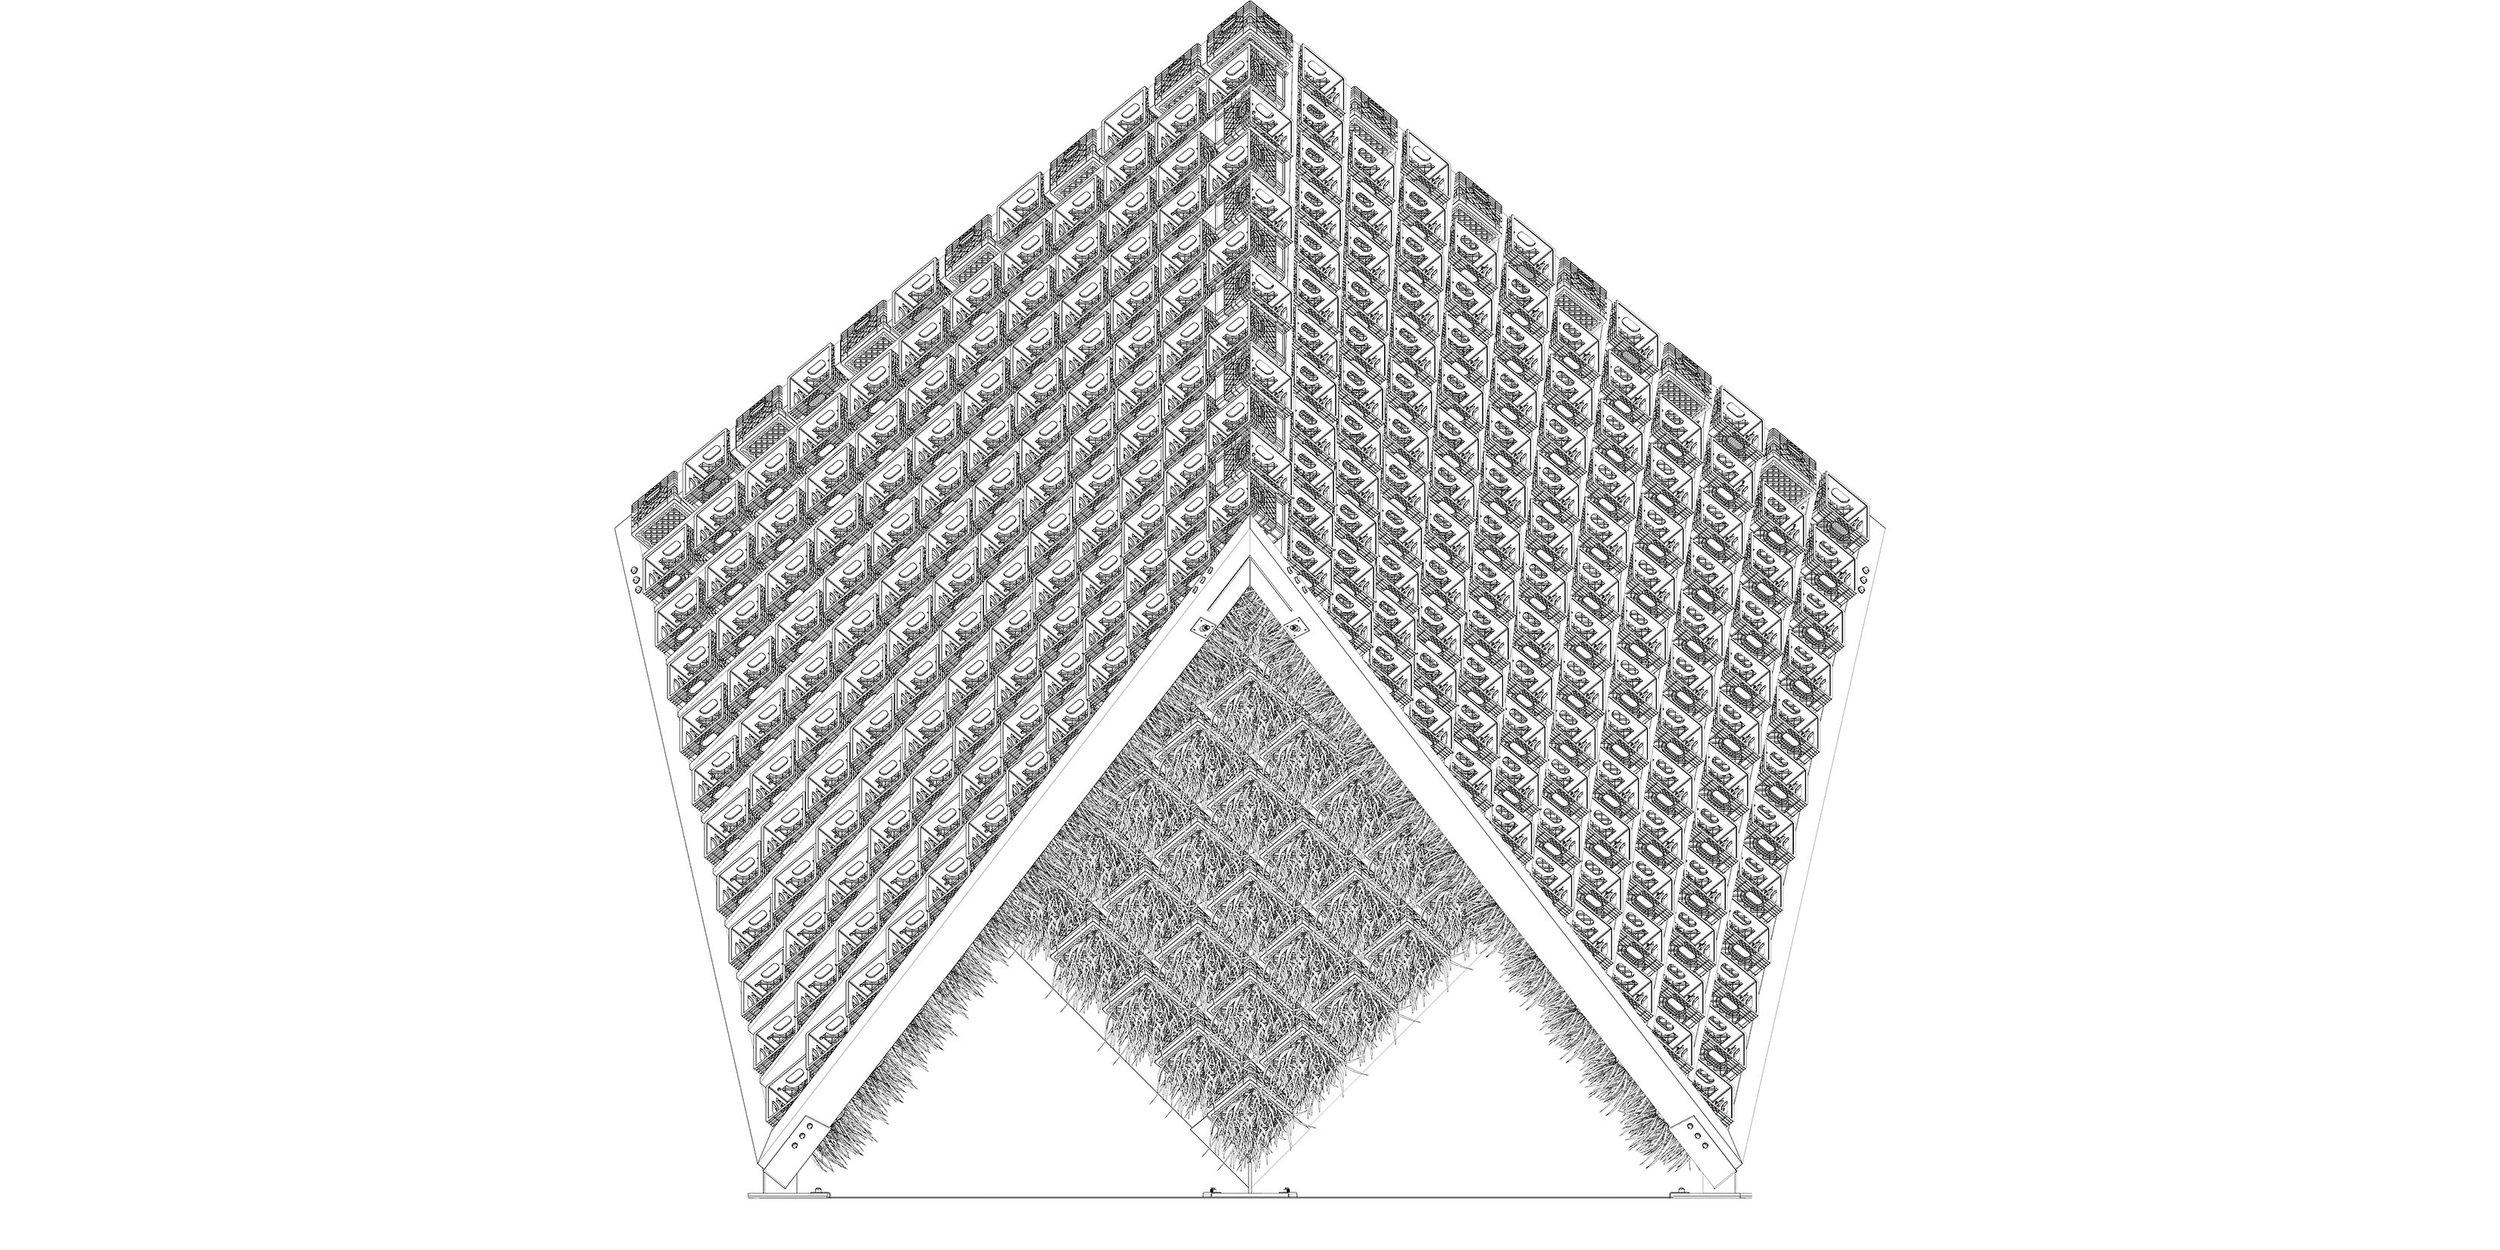 Assembly_Front_noeggcrate_web.jpg